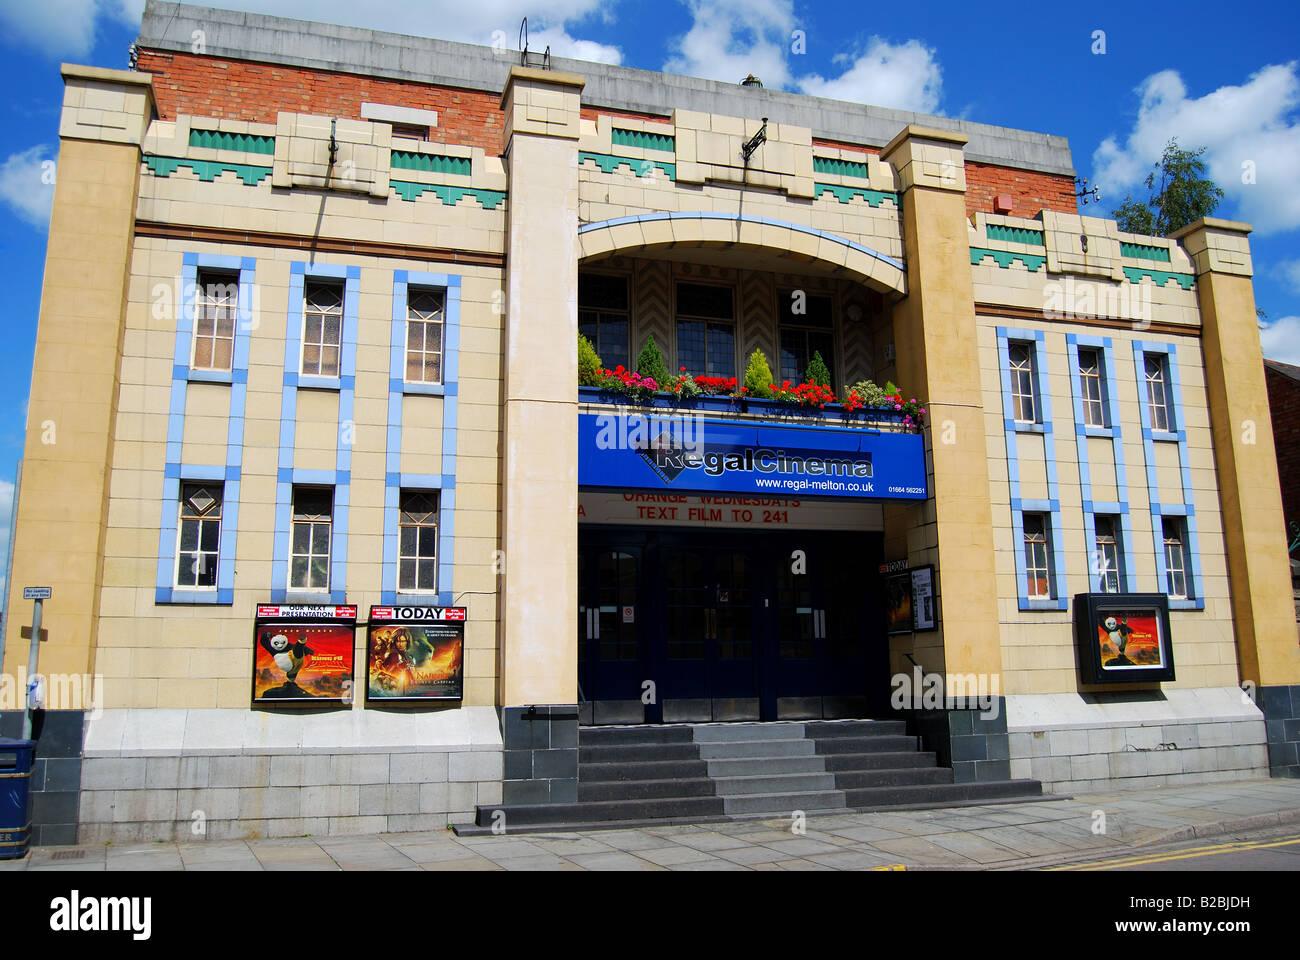 Art Deco Regal Cinema Building, King Street, Melton Mowbray, Leicestershire, England, United Kingdom - Stock Image